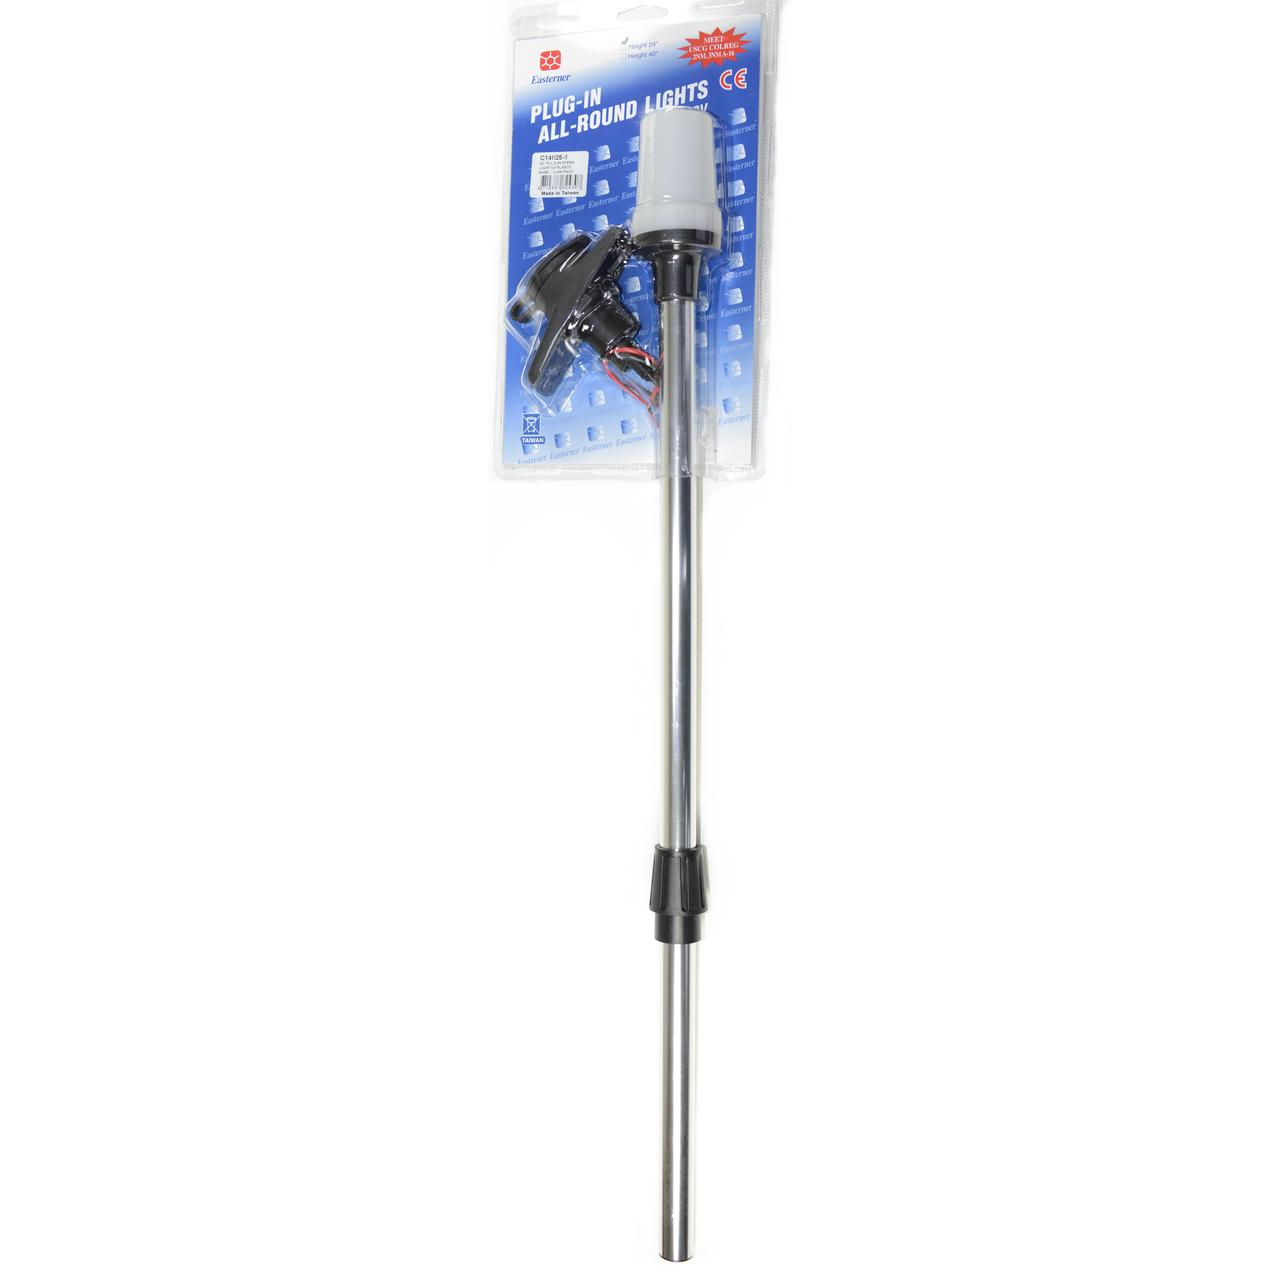 Гальмо вогонь C14025-1 висота 61 см